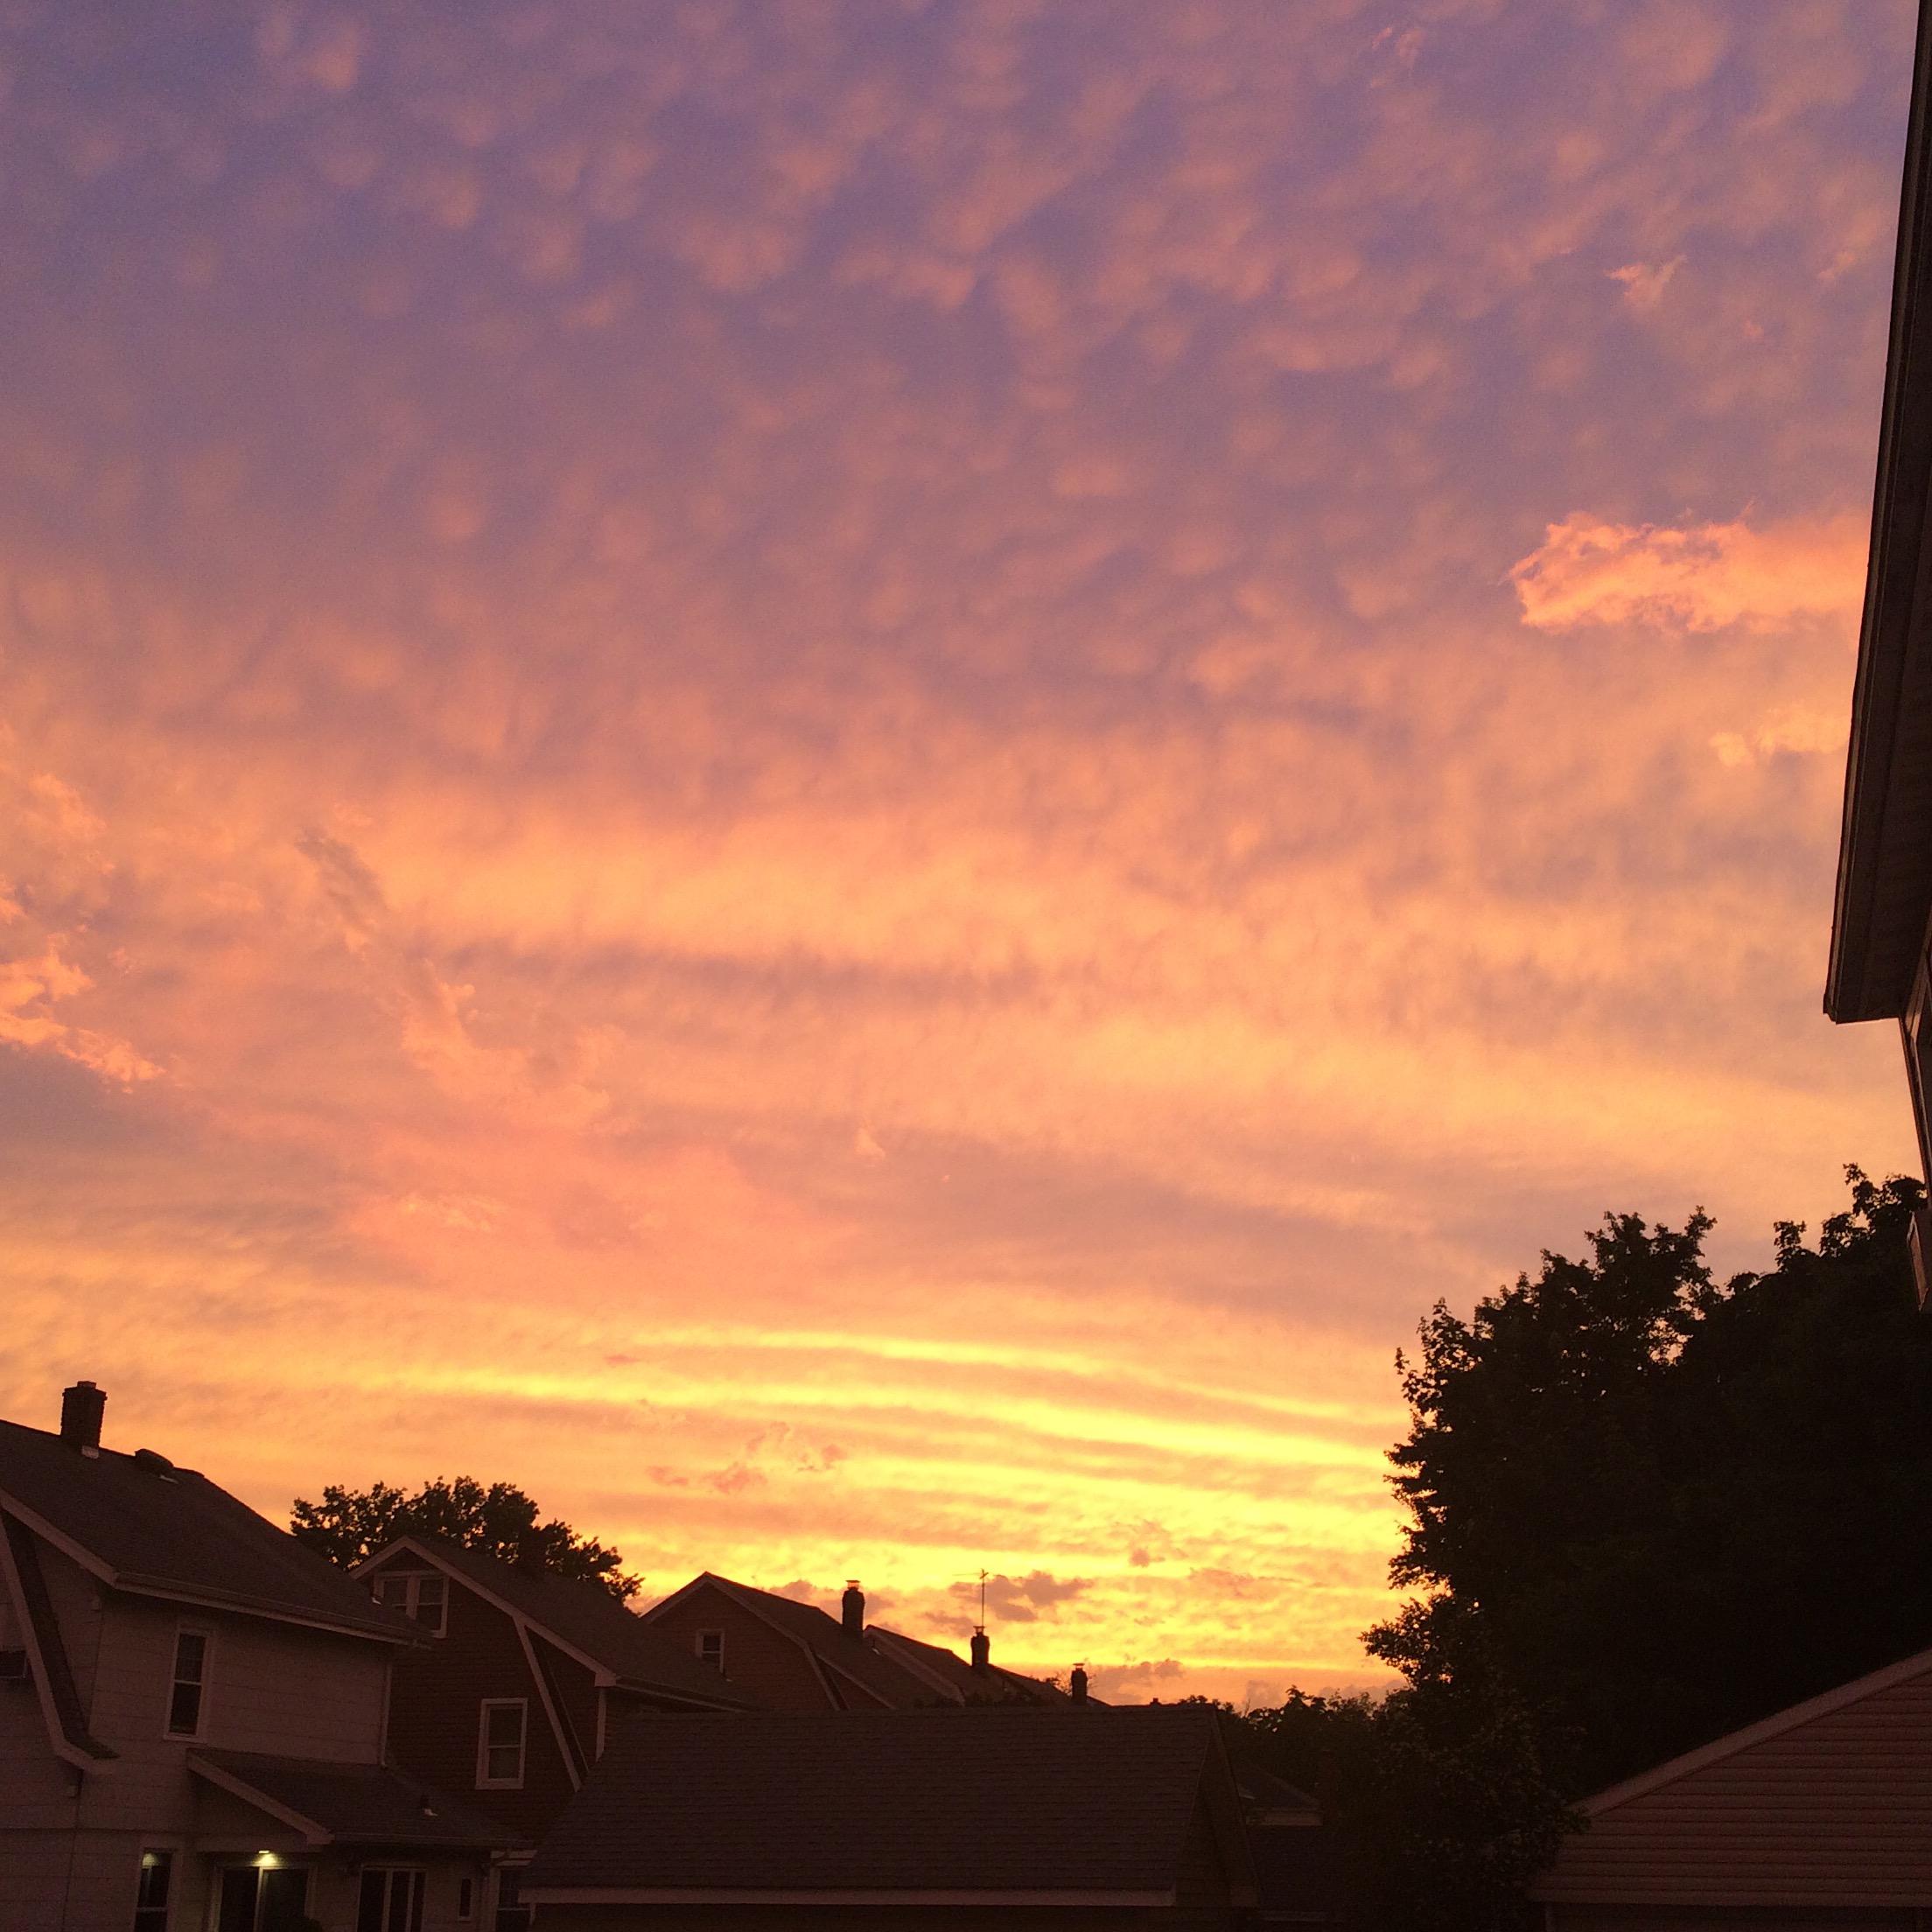 sunset@lynbrook